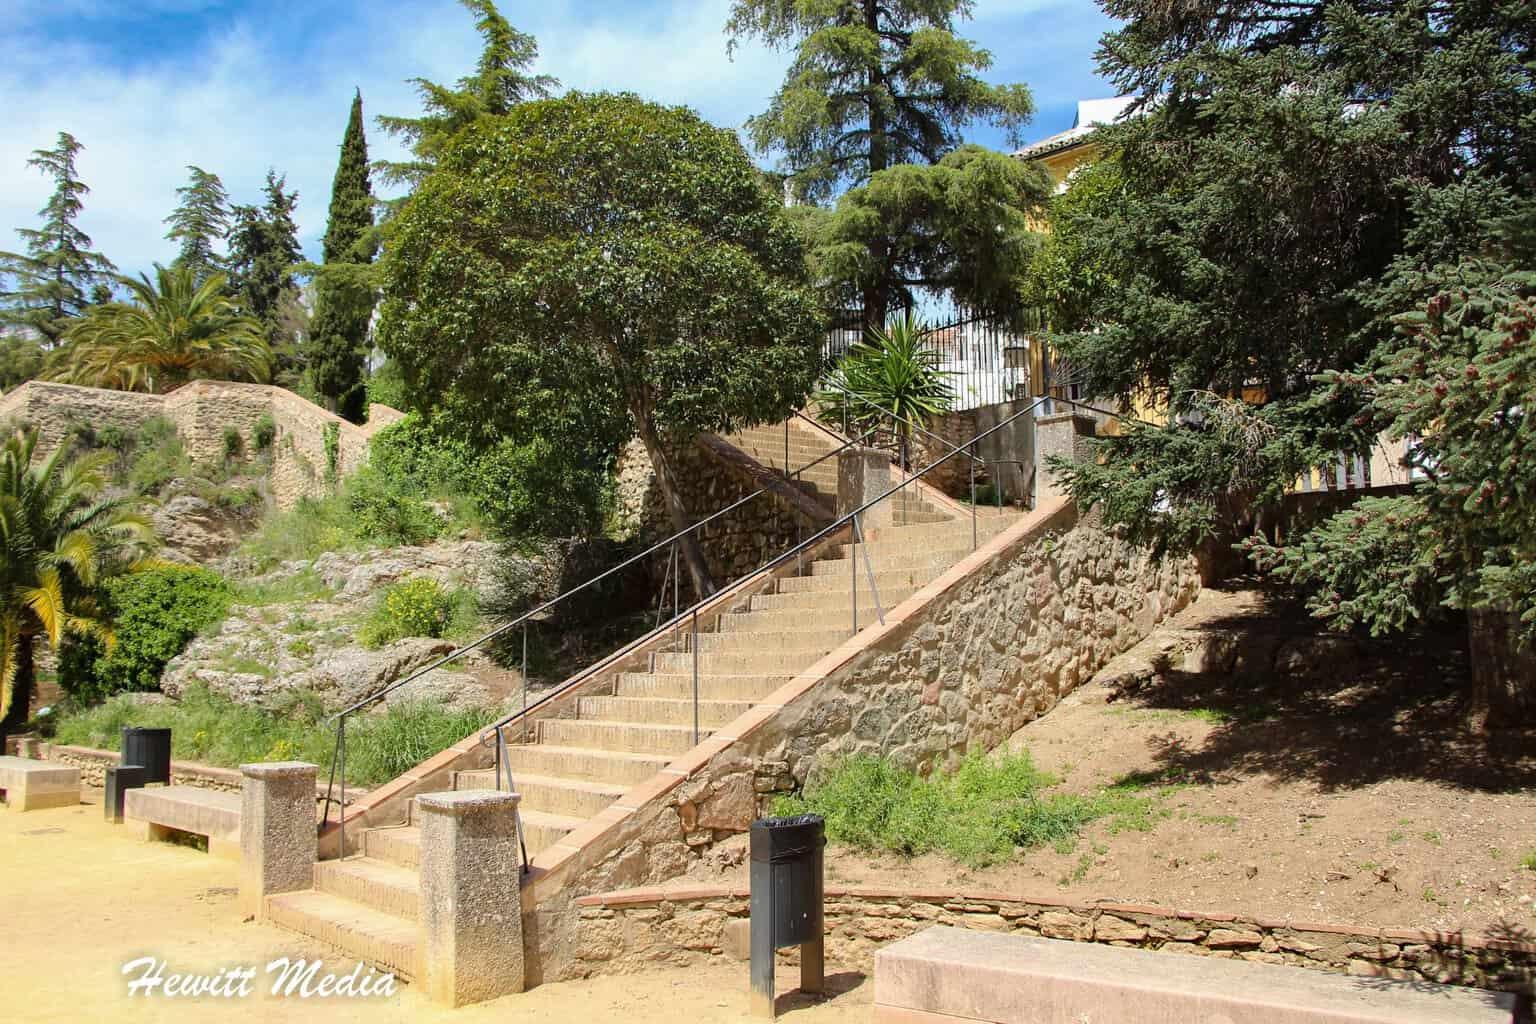 Jardines de Cuenca in Ronda, Spain